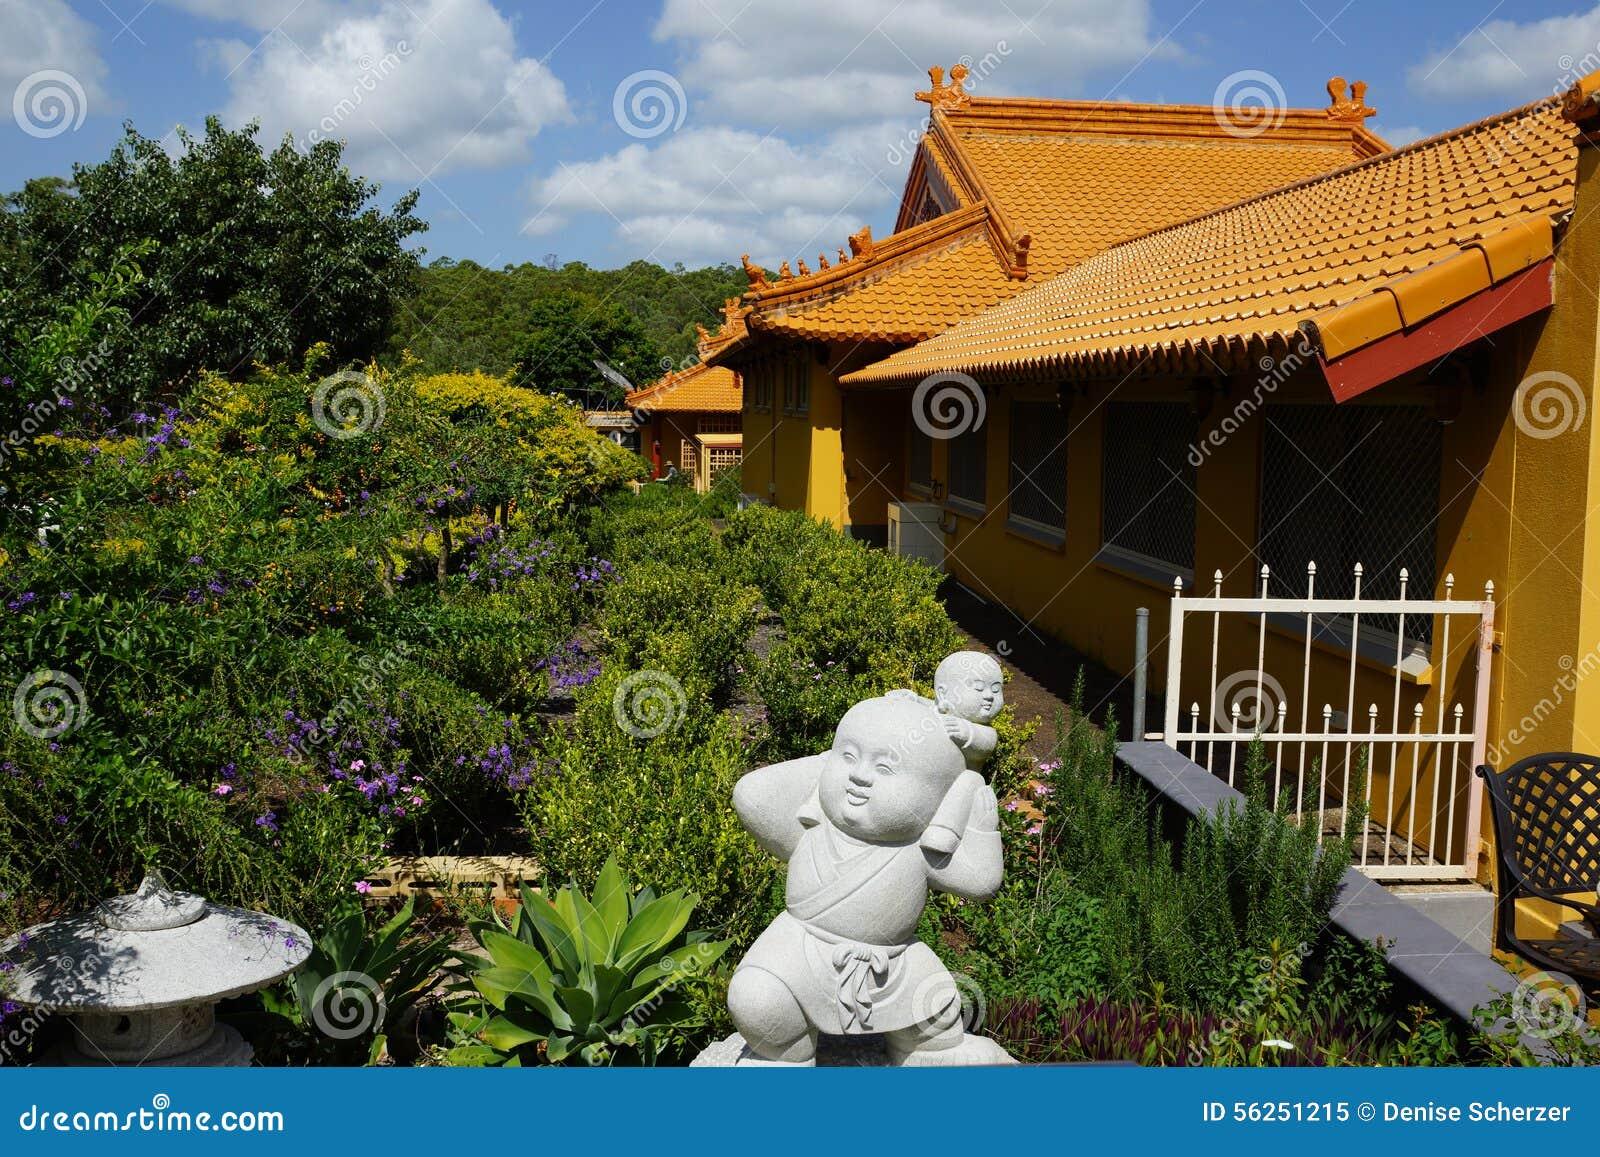 garden view buddhist personals Book buddha garden hotel, kathmandu on tripadvisor: see 47 traveler reviews, 32 candid photos, and great deals for buddha garden hotel, ranked #149 of 212 hotels in kathmandu and rated 4 of 5 at tripadvisor.